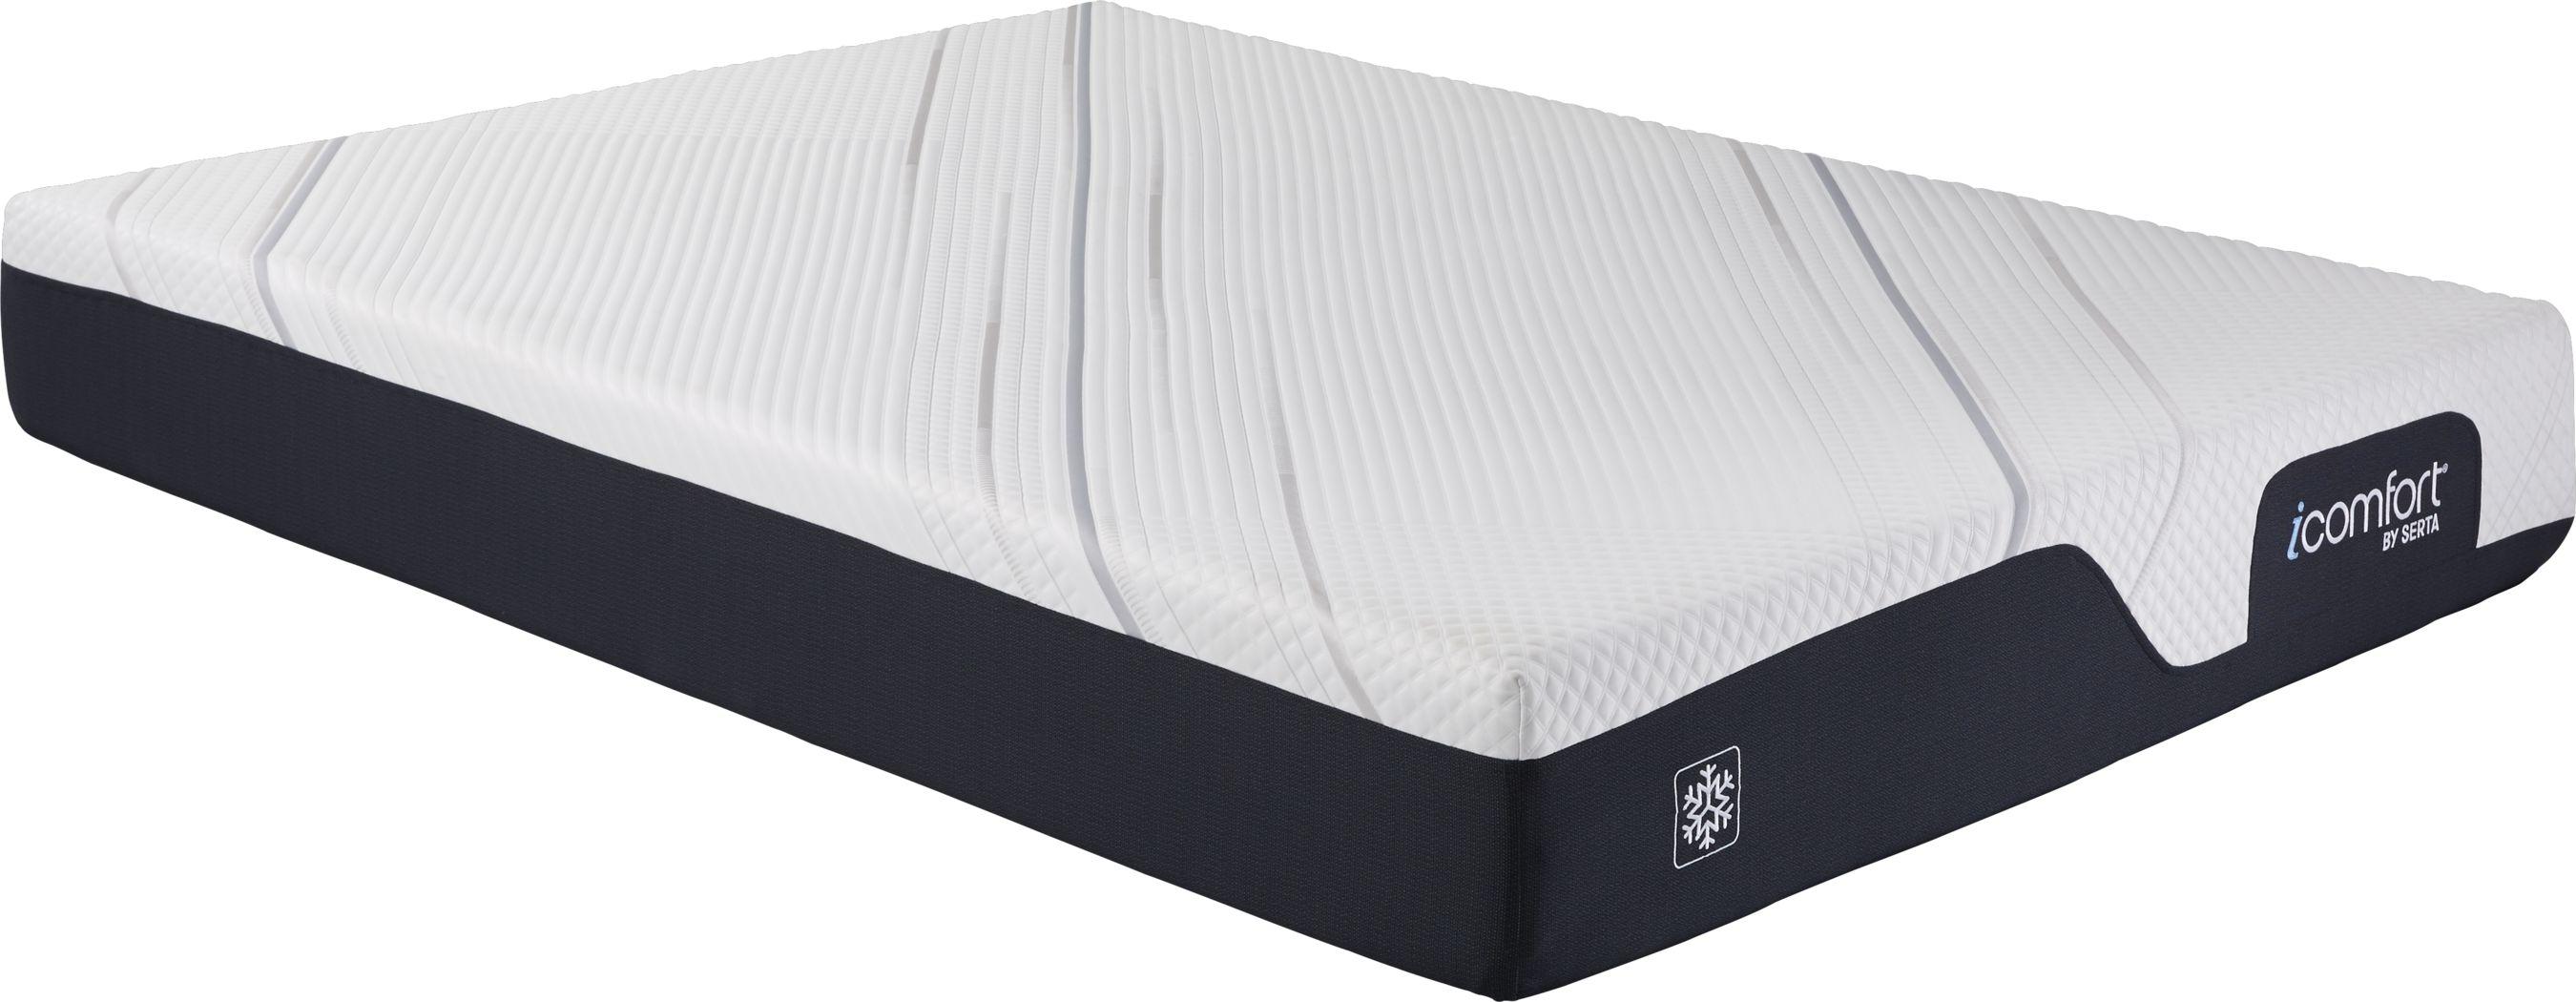 Serta iComfort CF1000 Queen Mattress